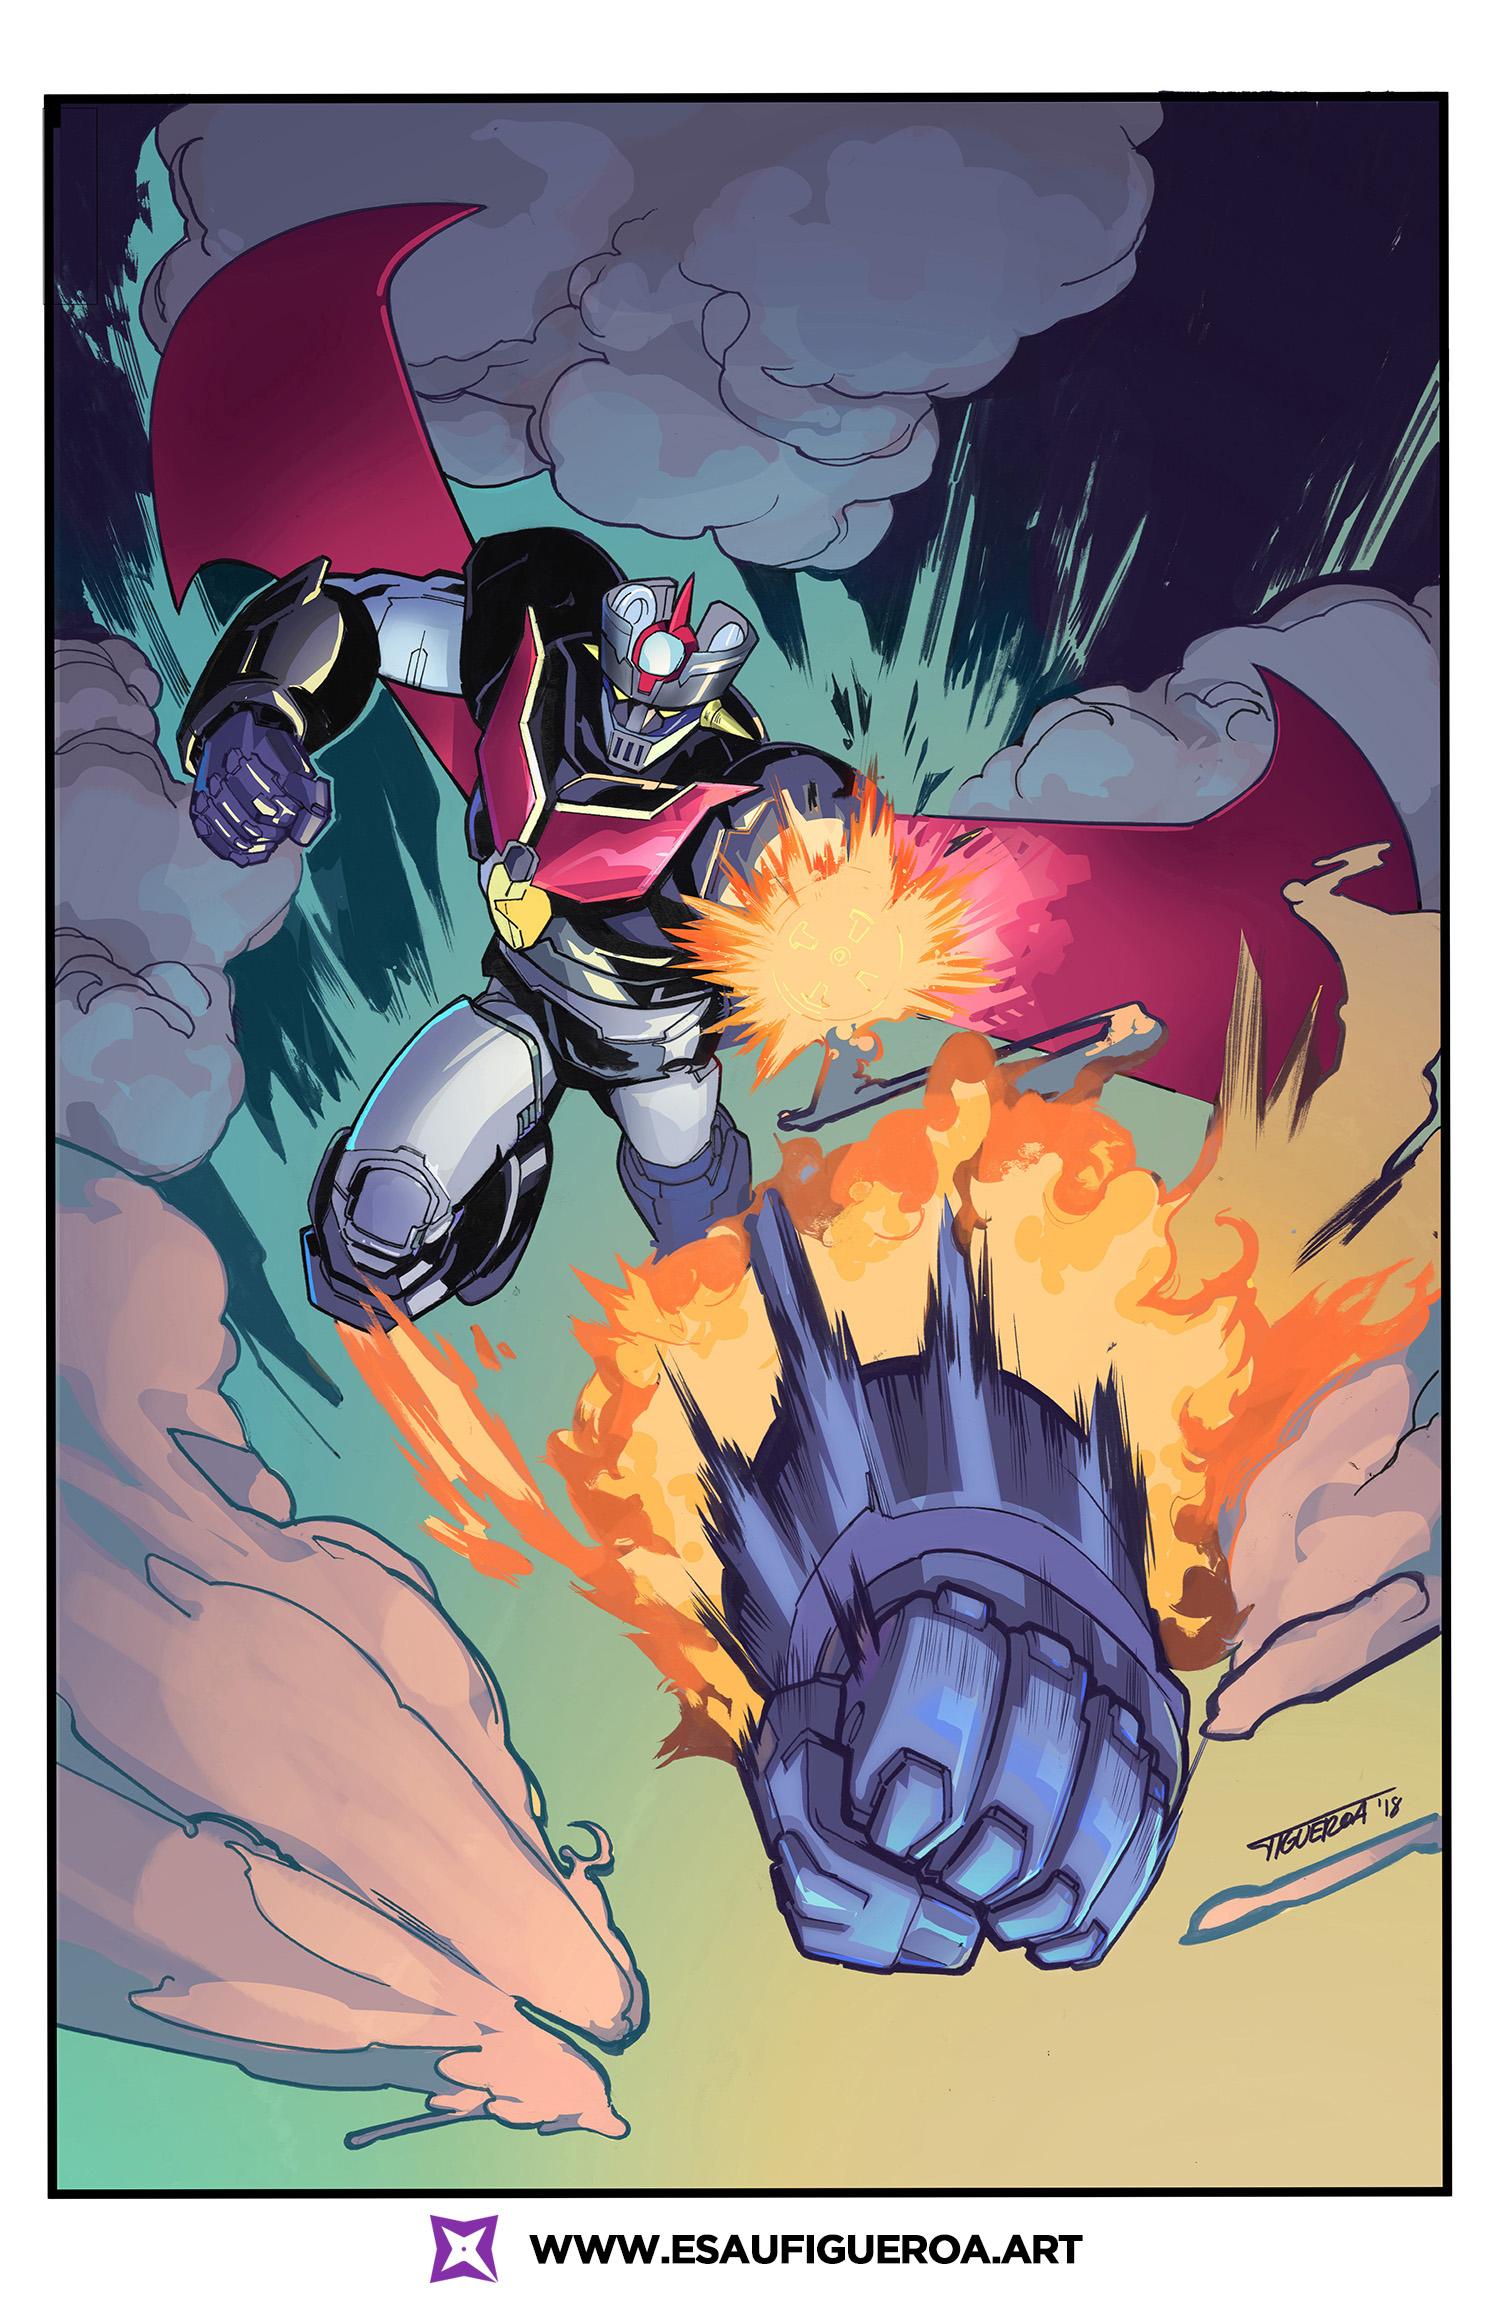 Rocket Punch!!!